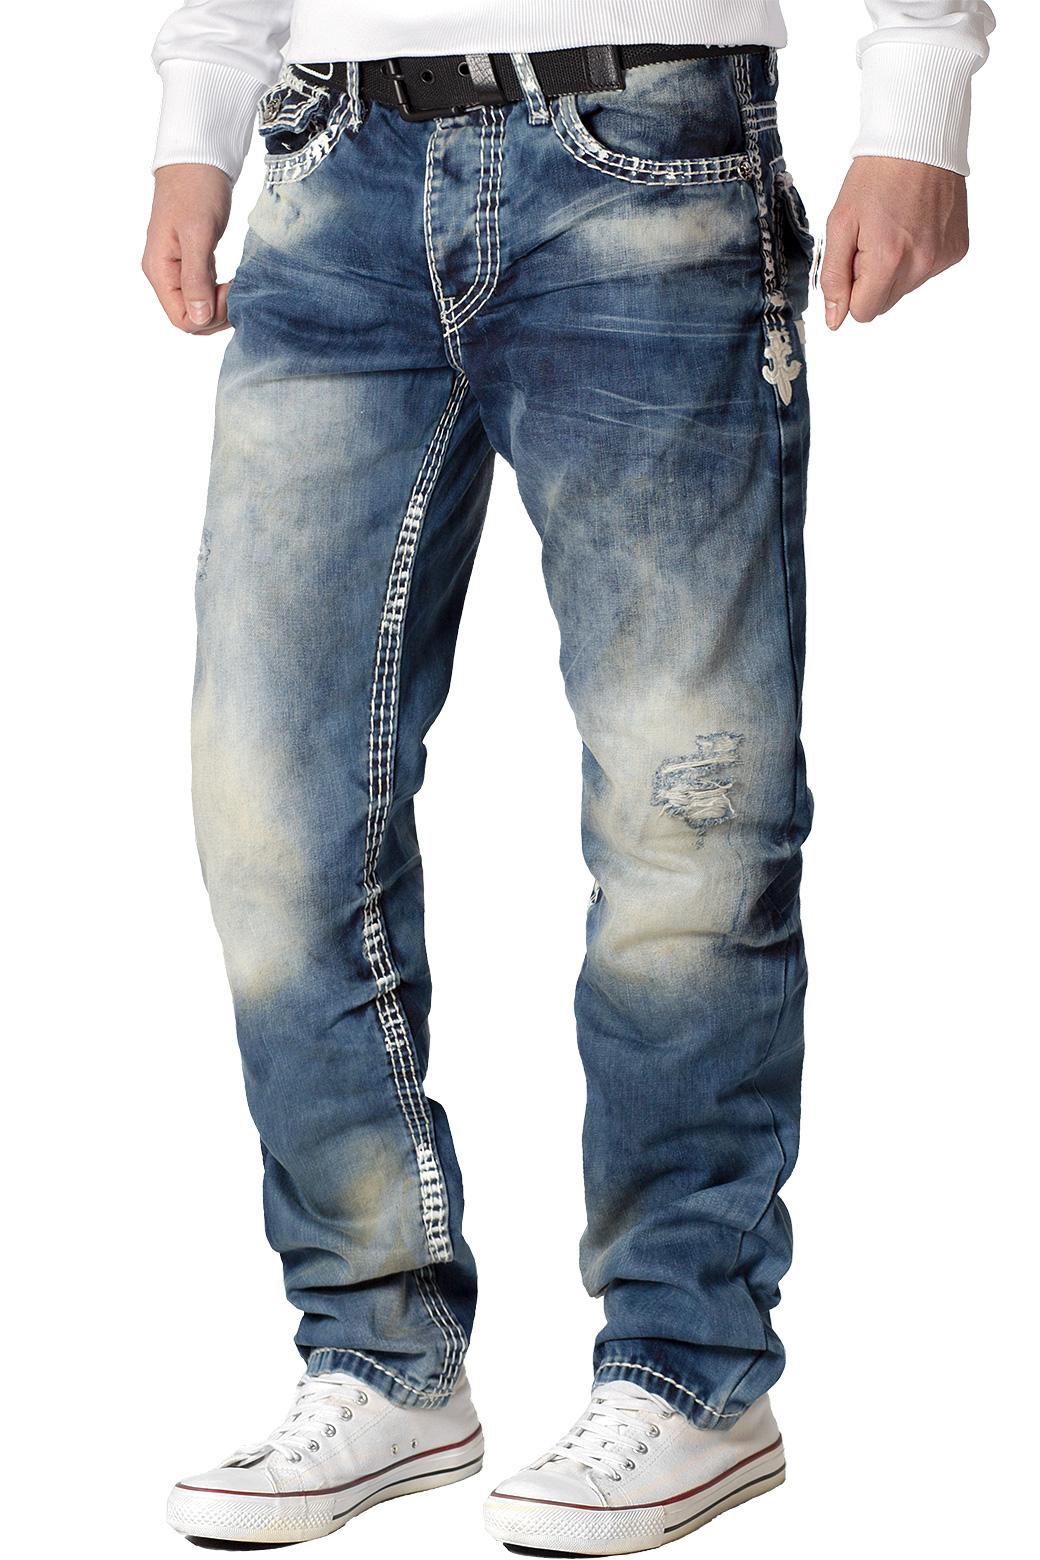 Cipo-amp-Baxx-Uomo-Jeans-Pantaloni-ricamate-Biker-Style-streetwear-nervature-pattern-Dope miniatura 11